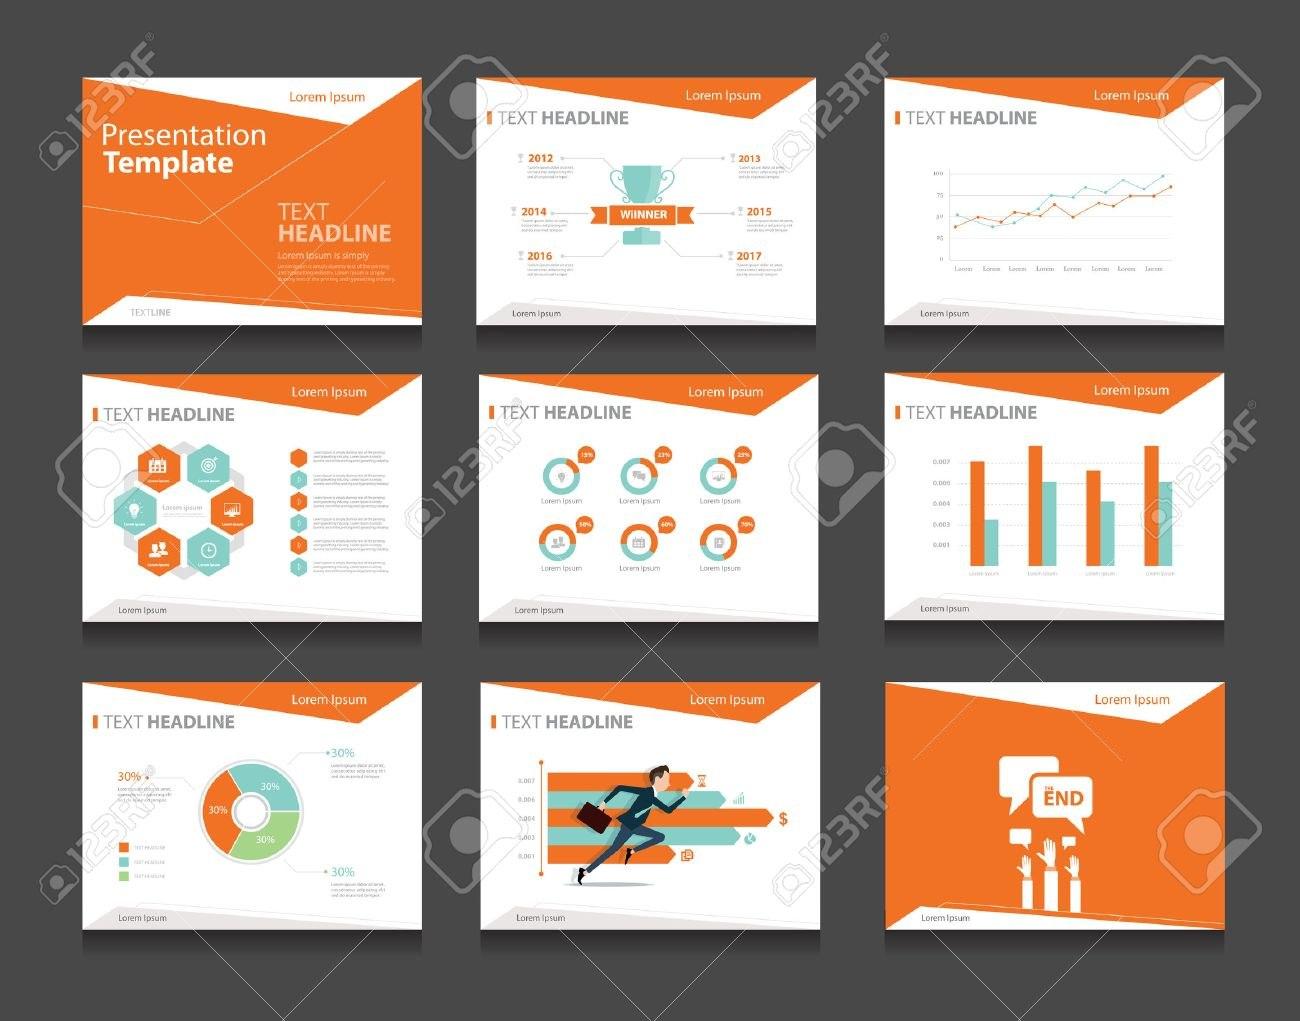 Infografik Orange Business Präsentationsvorlage Setpowerpoint Pertaining To How To Design A Powerpoint Template